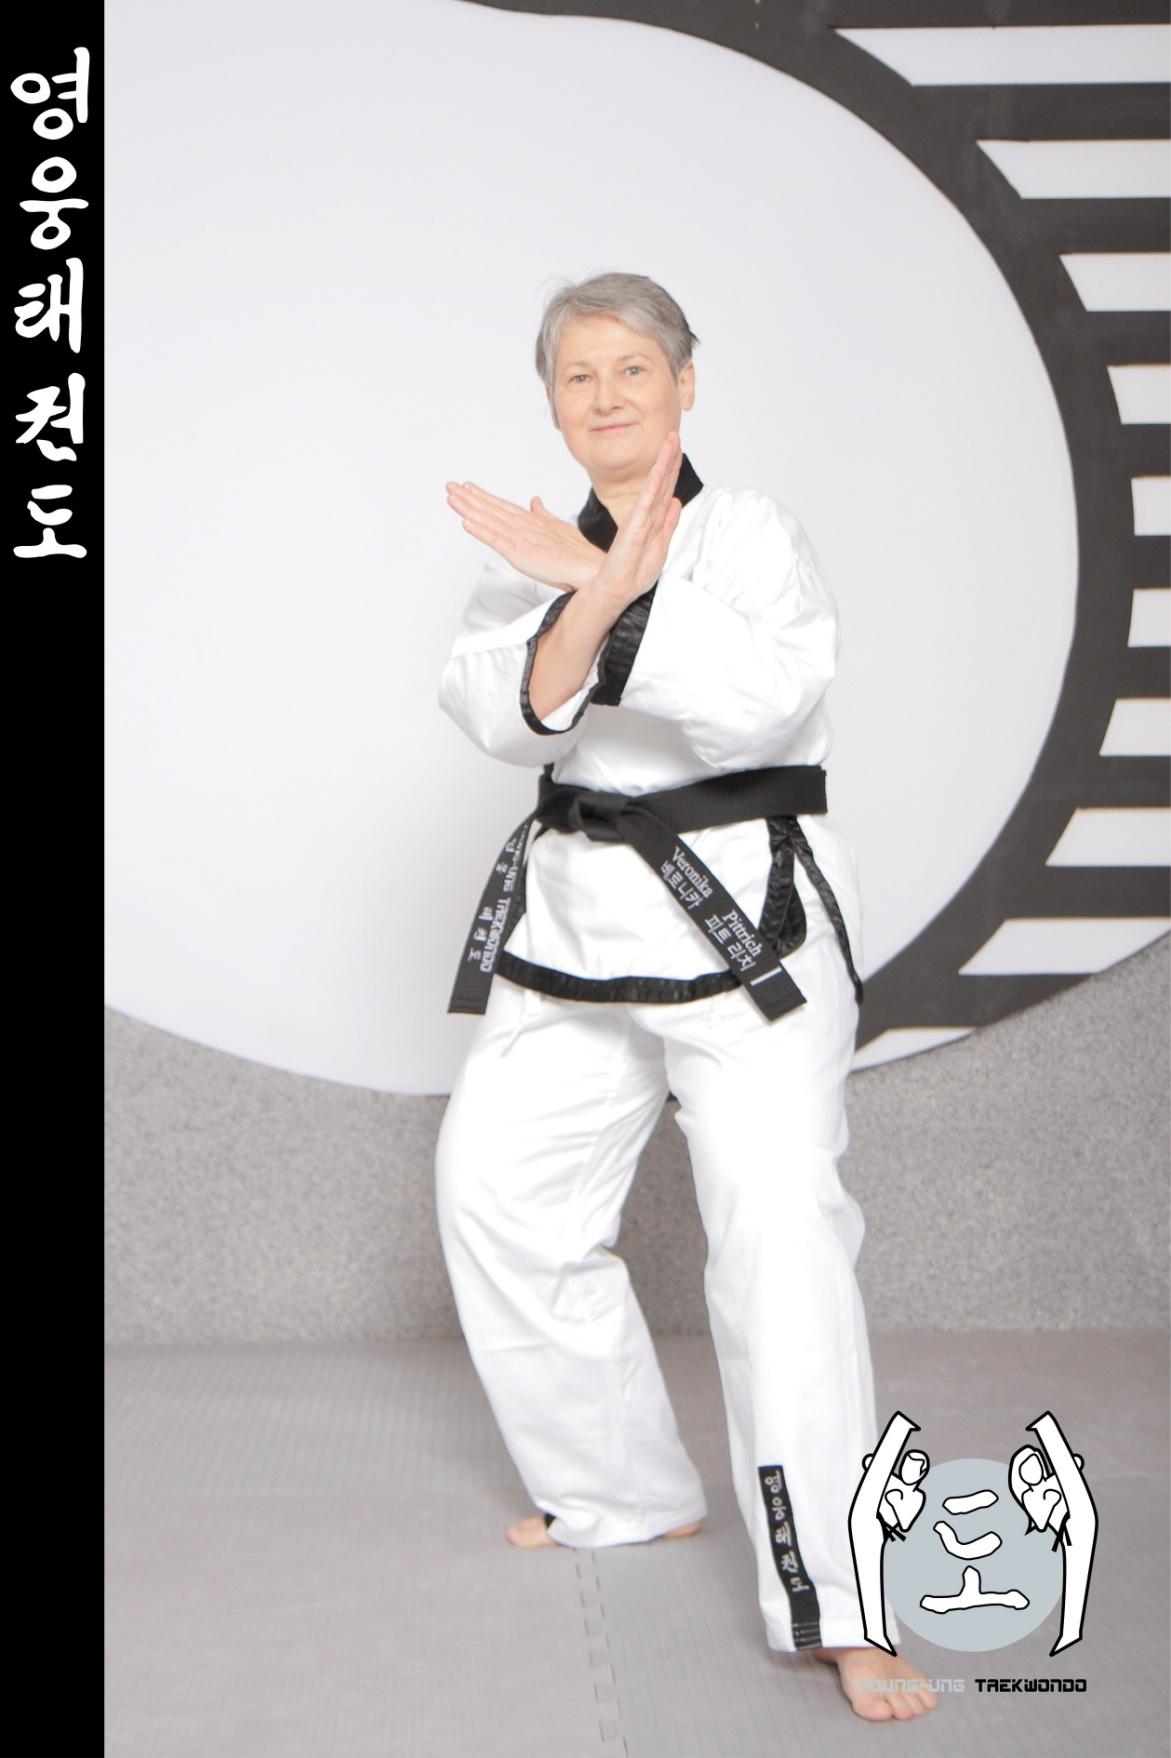 Alte Frau im Taekwondo Kampfanzug mit Schwarzgurt